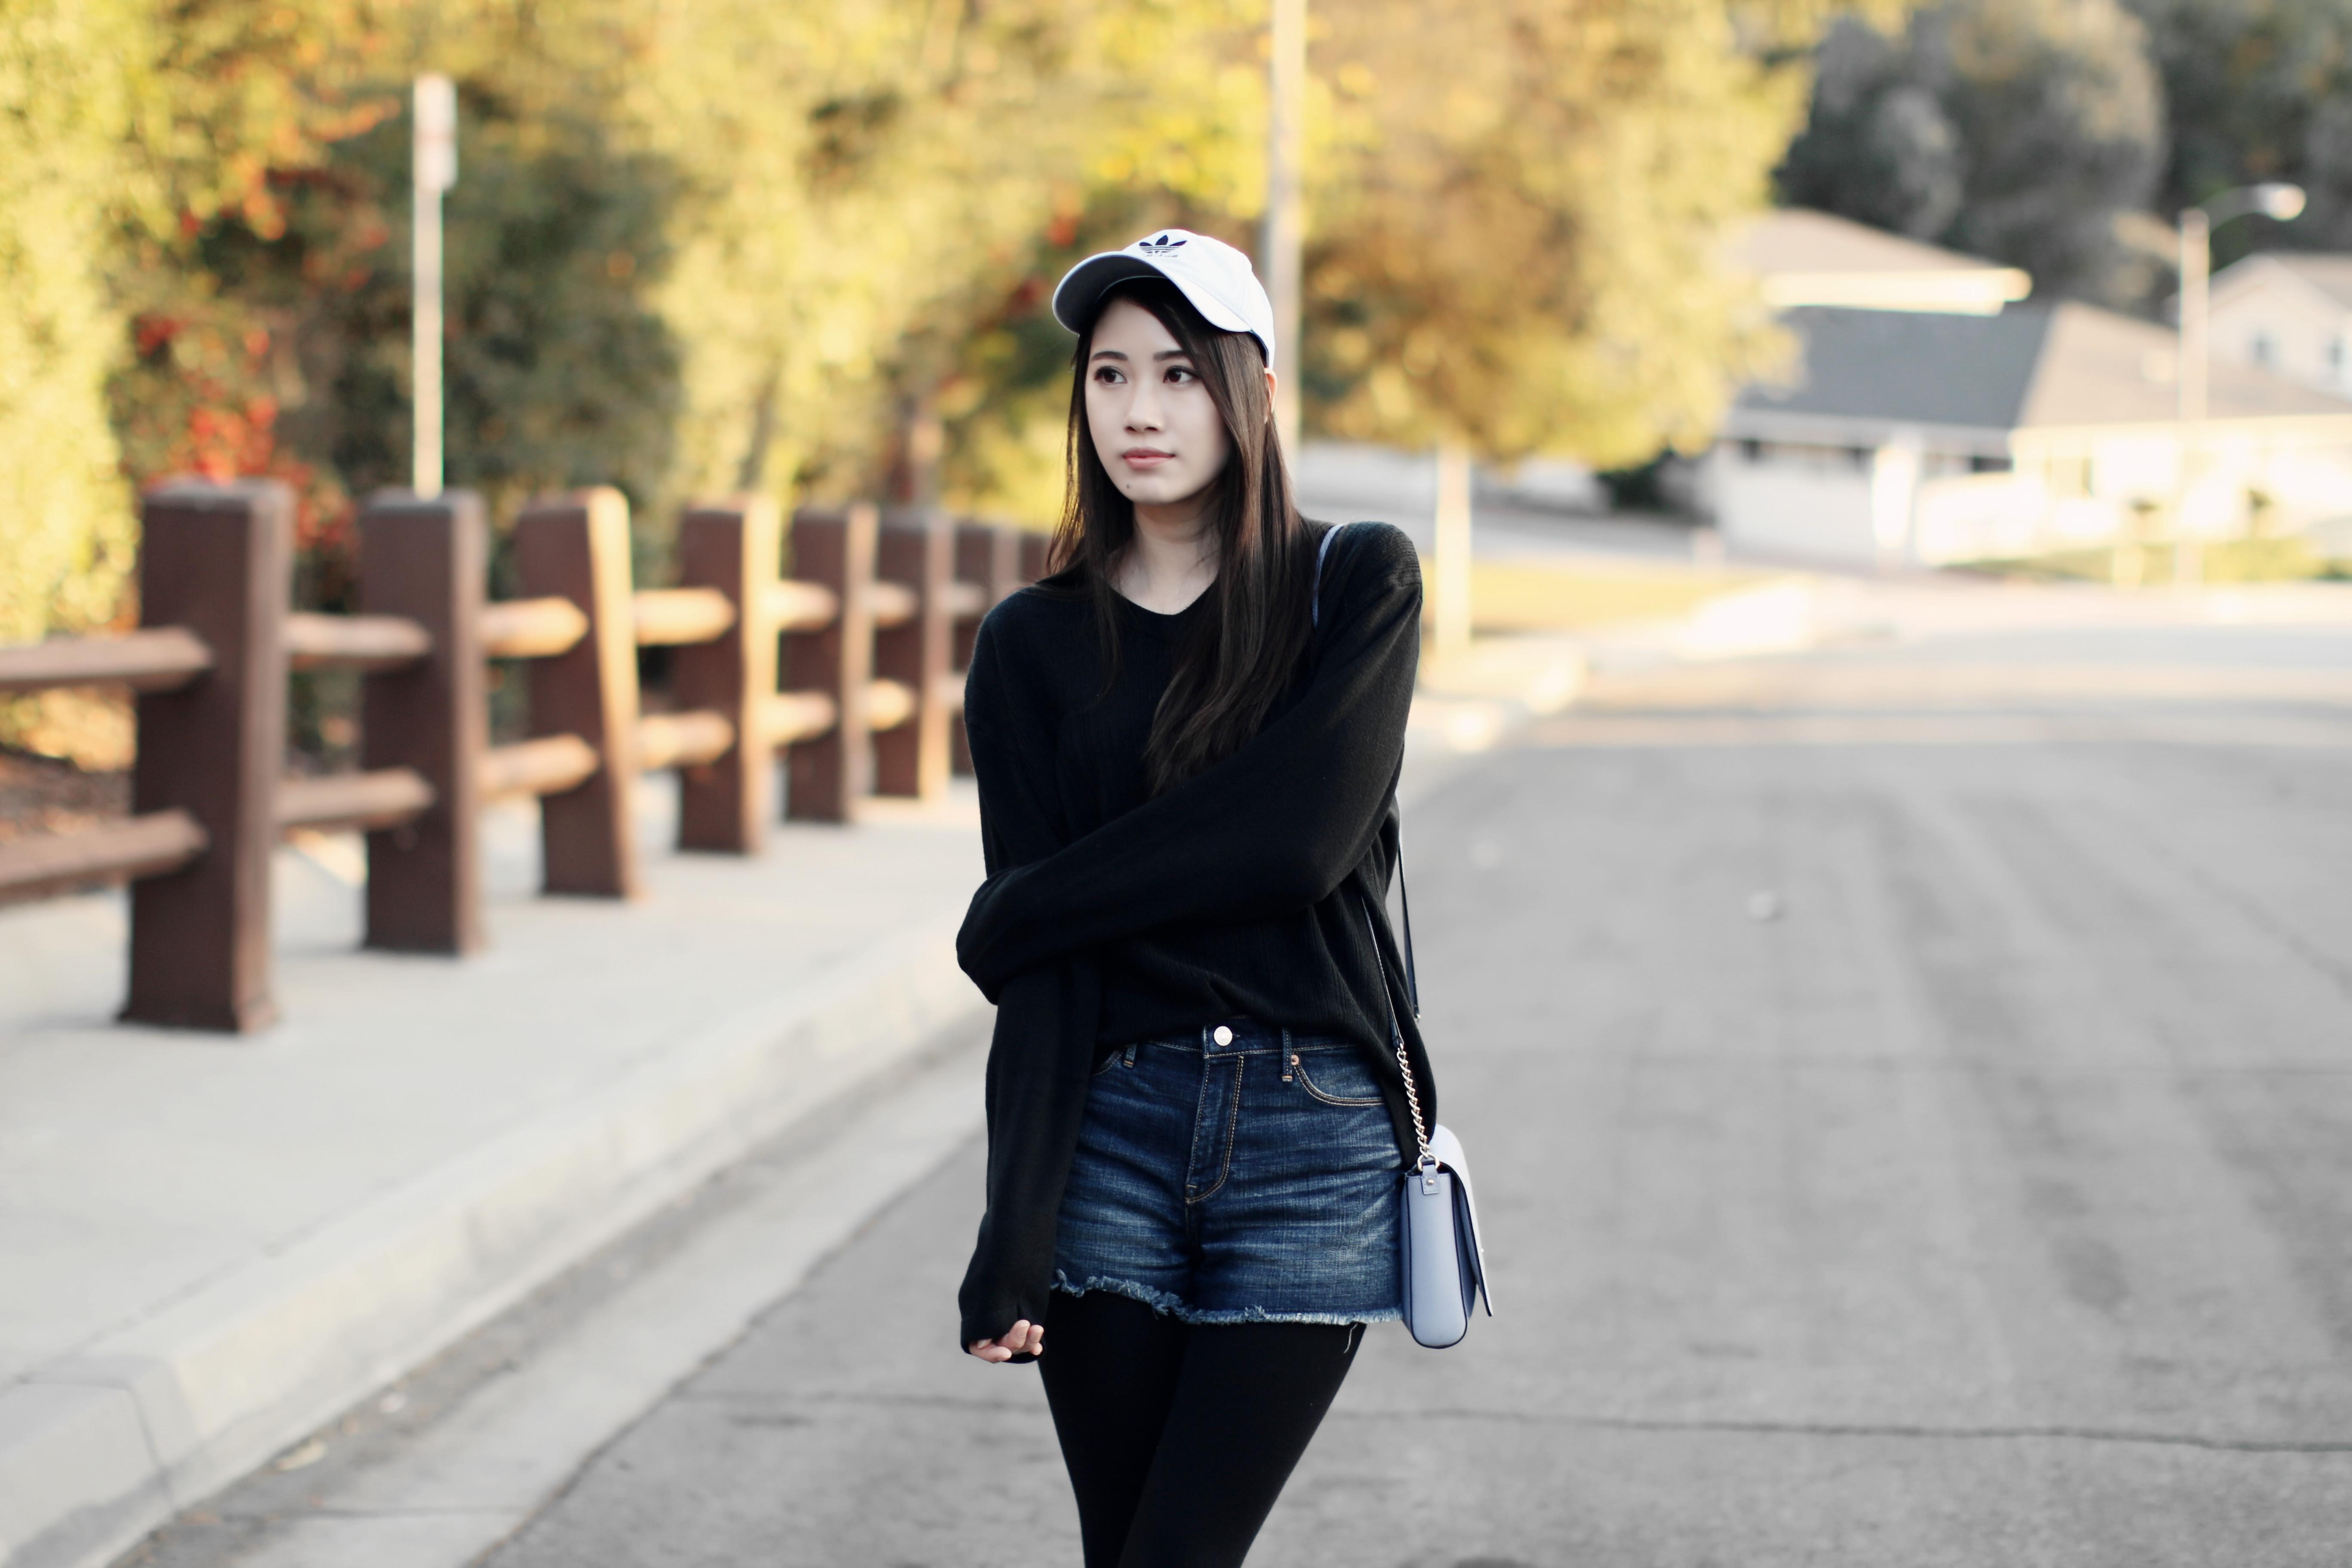 4366-ootd-fashion-style-outfitoftheday-wiwt-streetstyle-adidas-urbanoutfitters-hm-f21xme-nike-elizabeeetht-clothestoyouuu